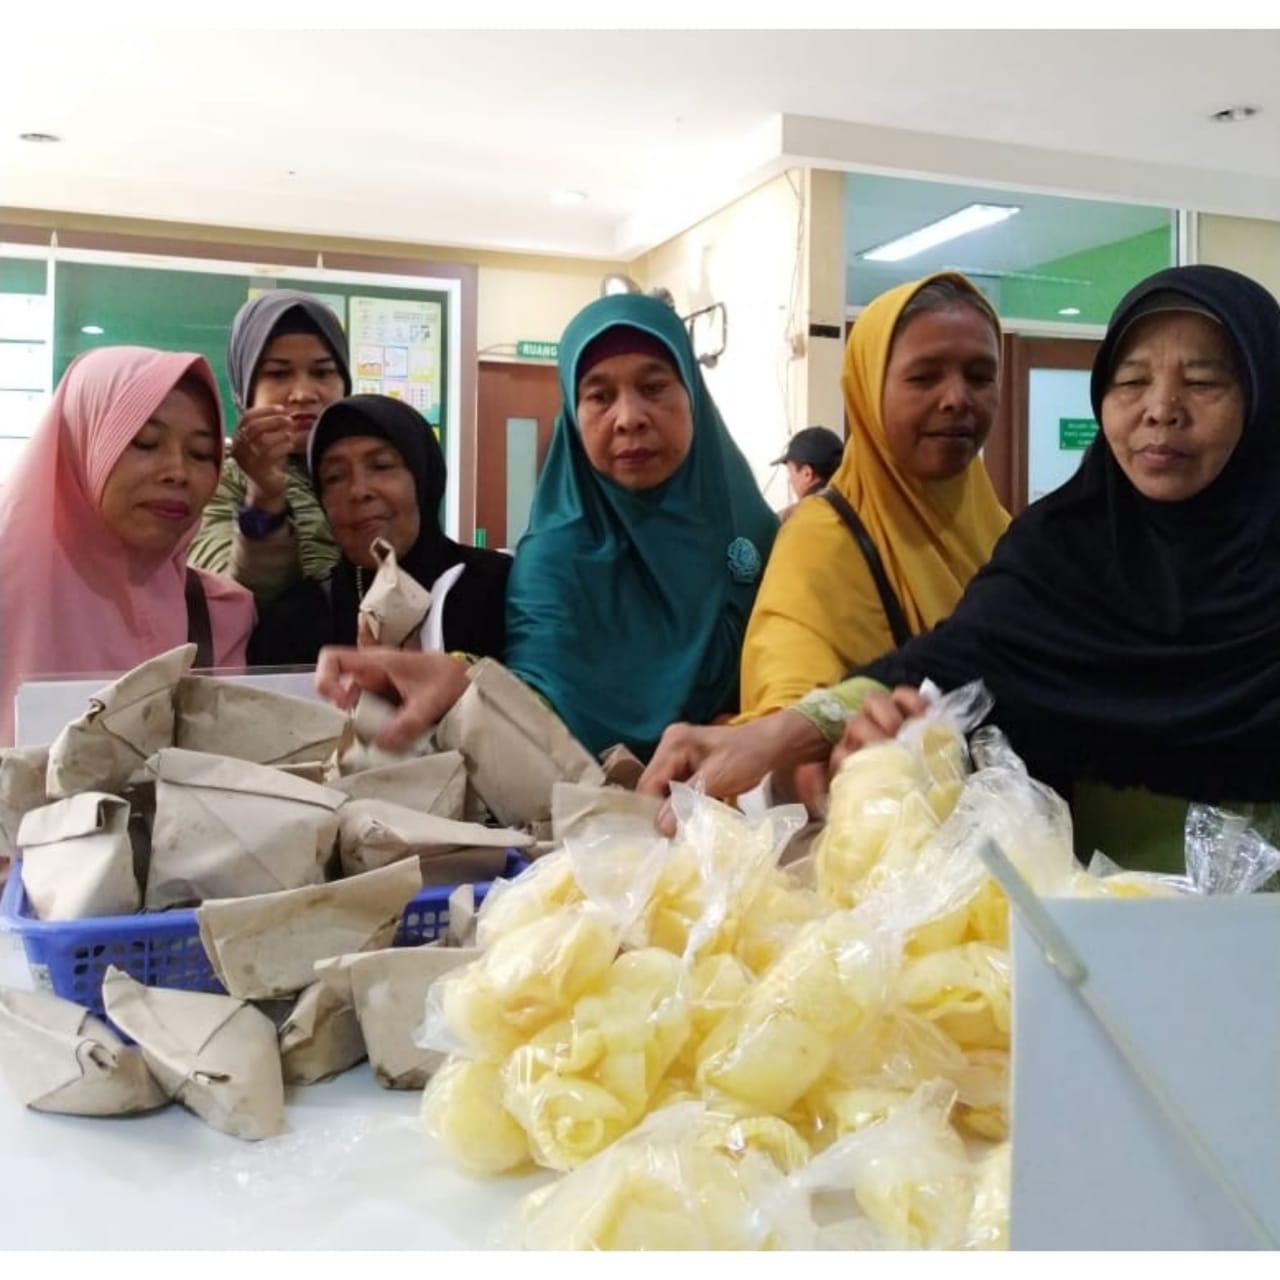 Jumat Berbagi Kembali Sapa Pasien RST Dompet Dhuafa